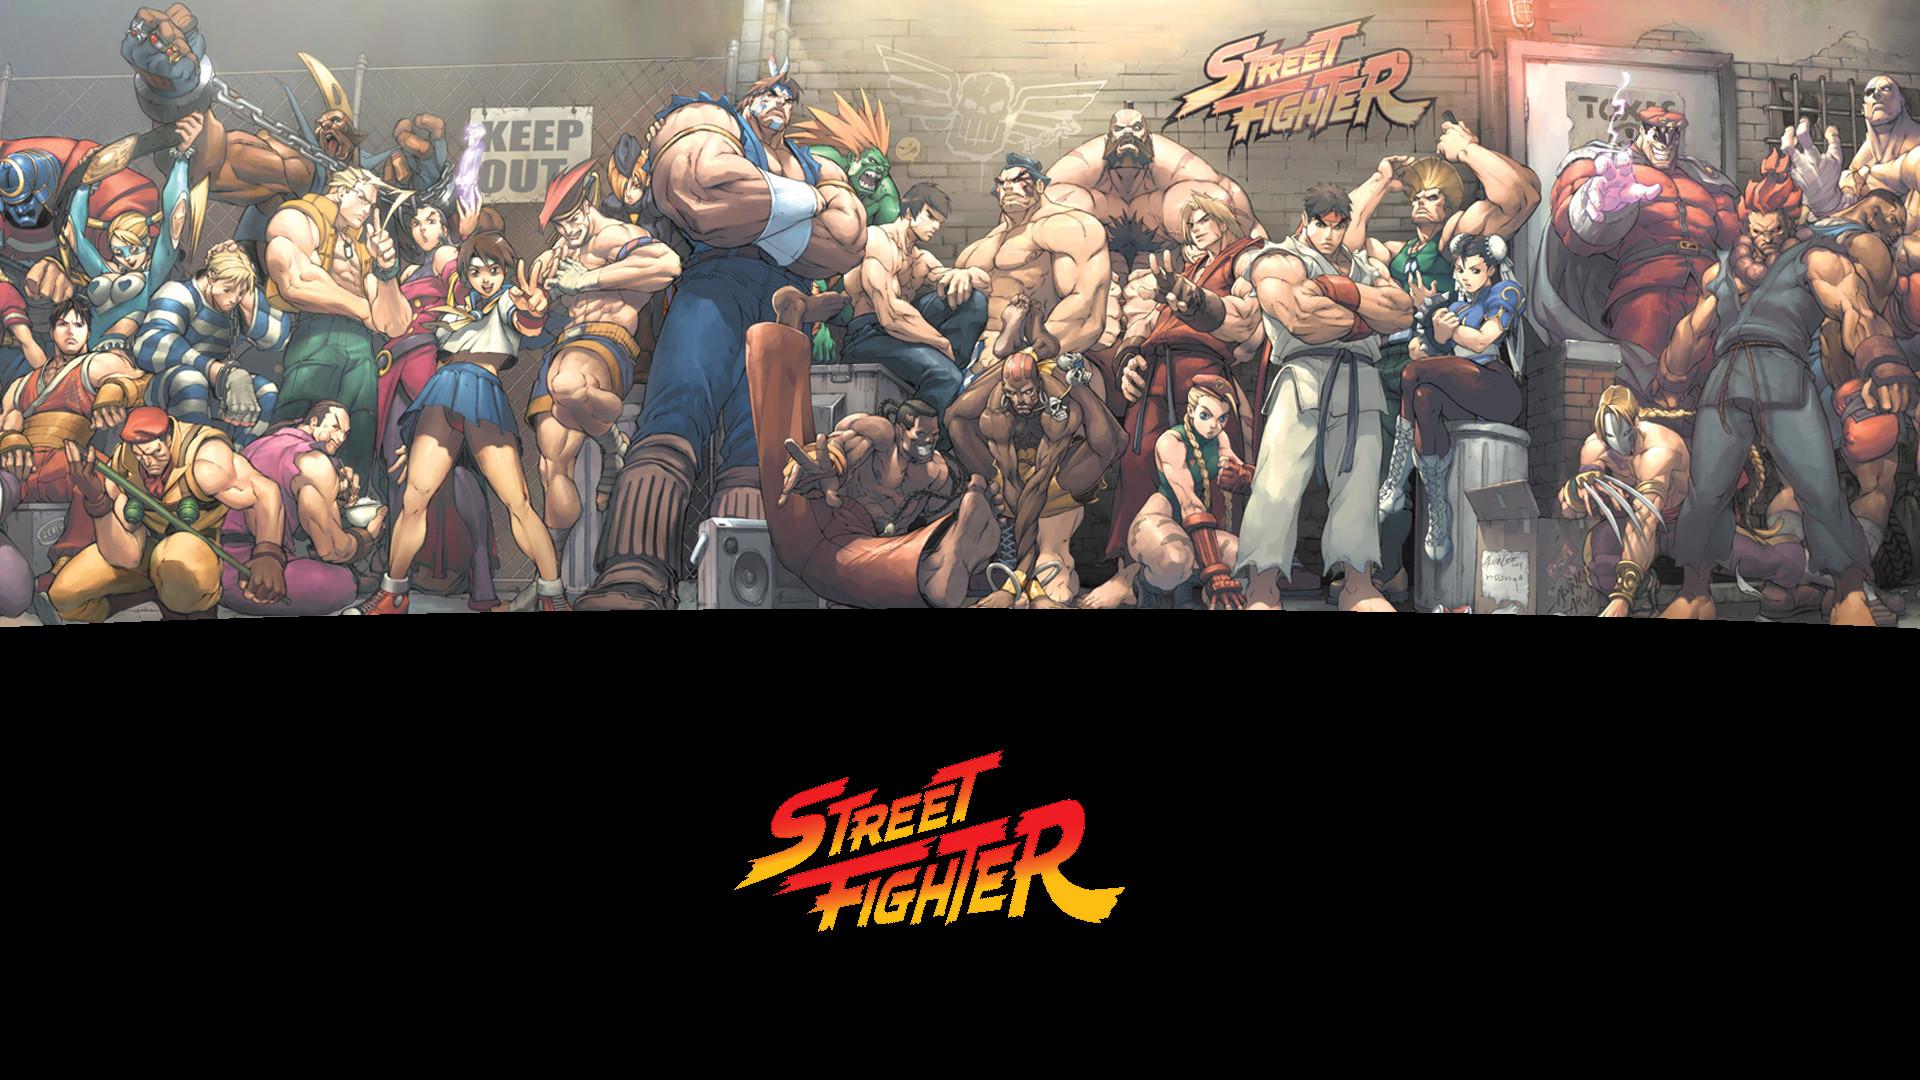 Street Fighter Hd Wallpaper Wallpapertag